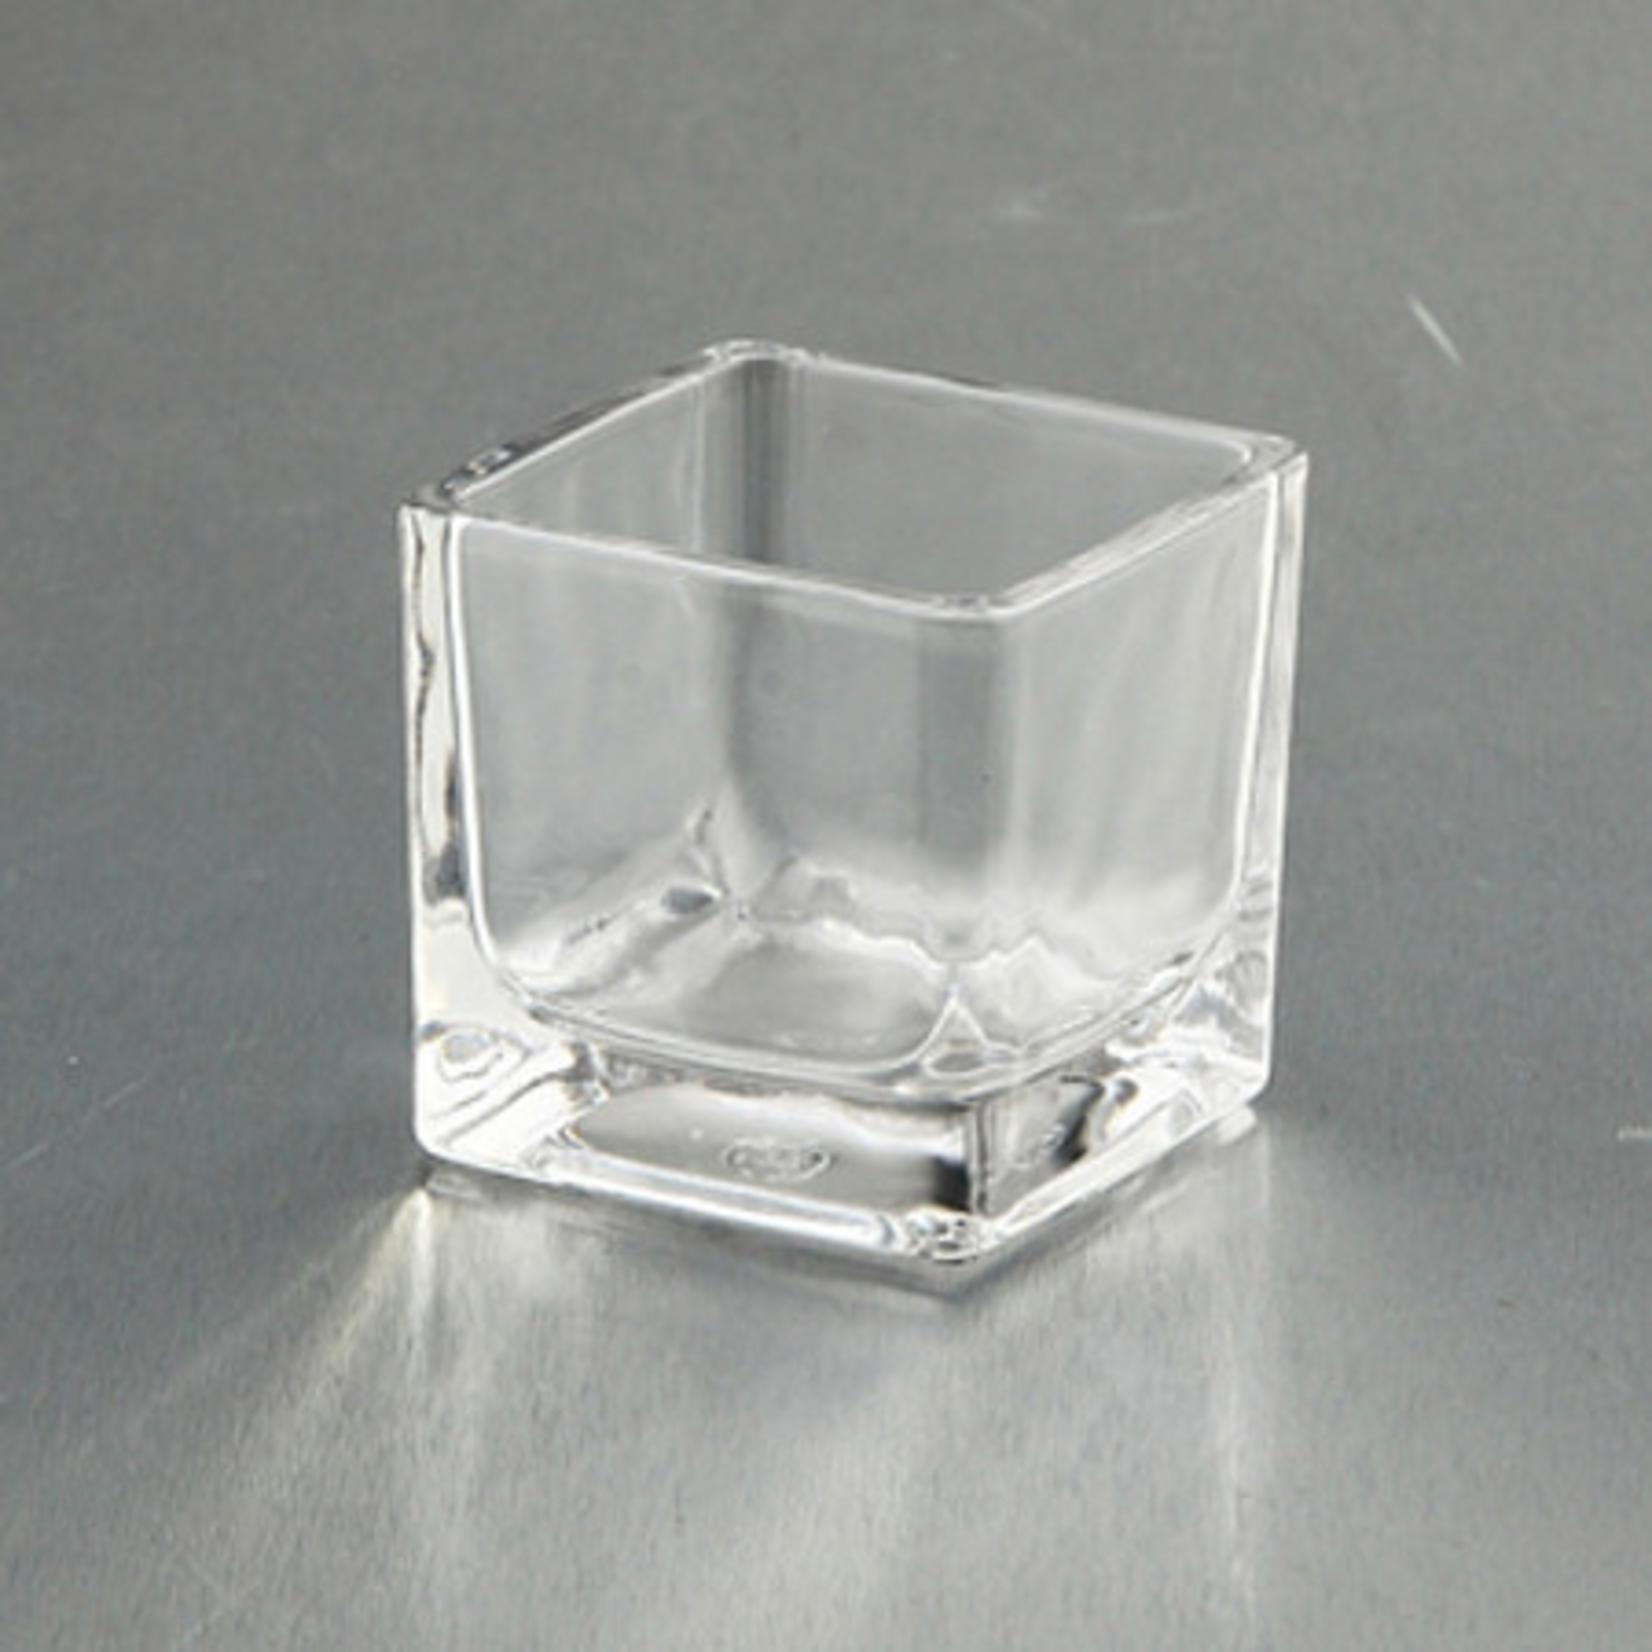 "2.5"" x 2.5"" x 2.5"" SQUARE GLASS CUBE VOTIVE"